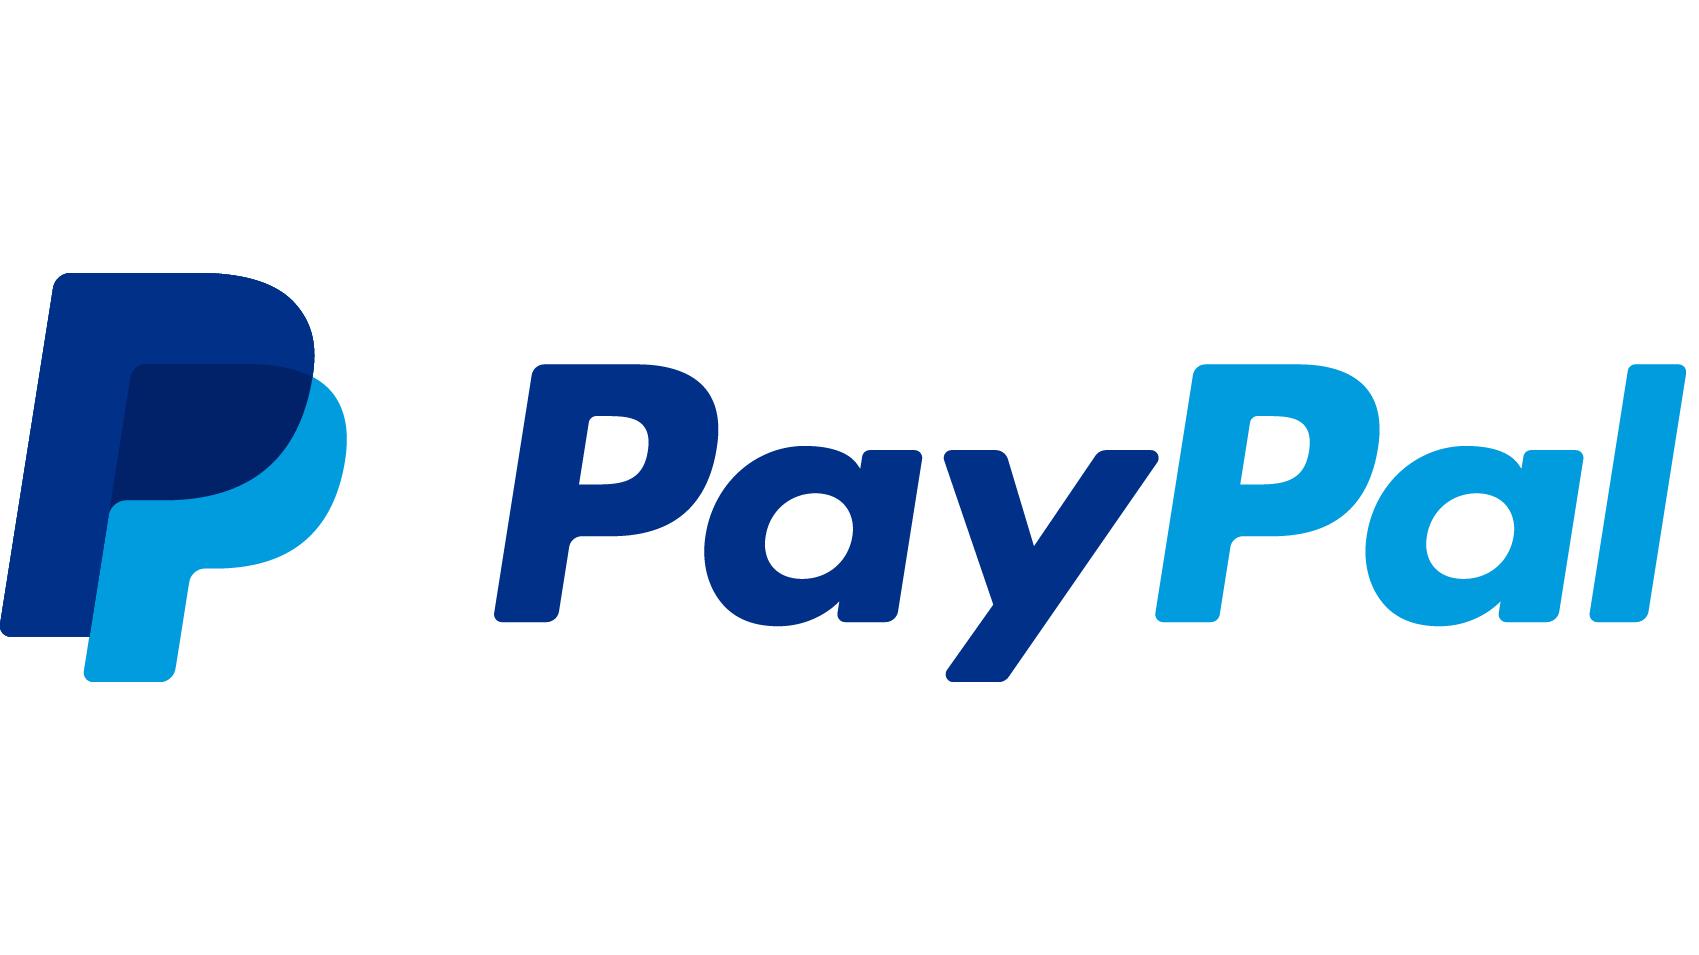 paypal_mb8k